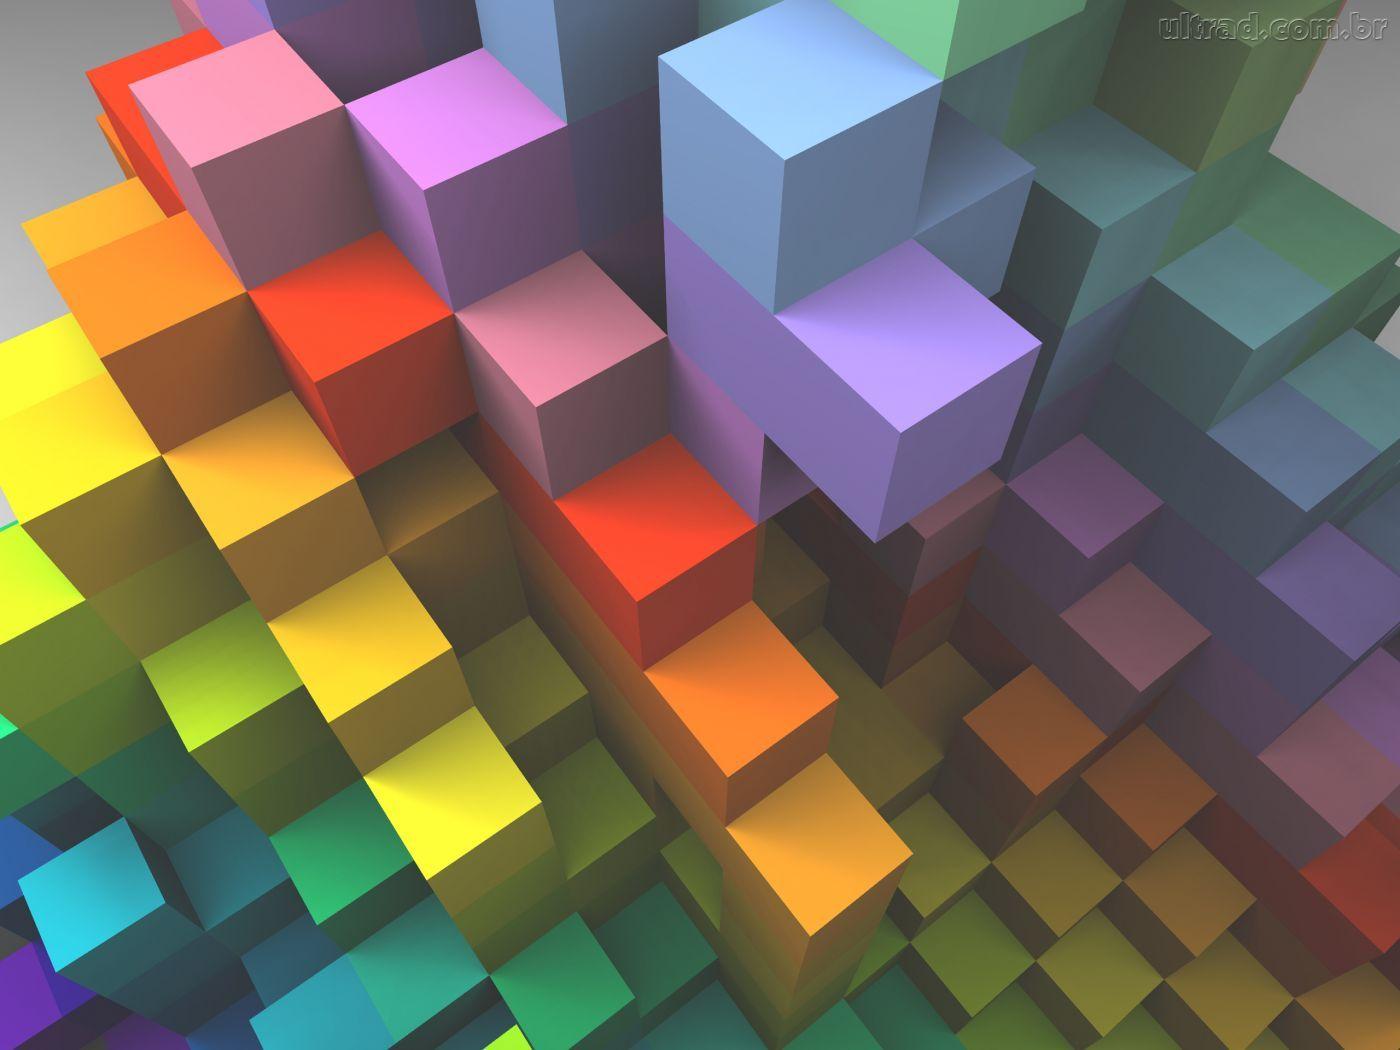 Formas Geometricas Coloridas Pesquisa Google Ipad Air Wallpaper Spectrum Wallpaper Color Spectrum Wallpaper